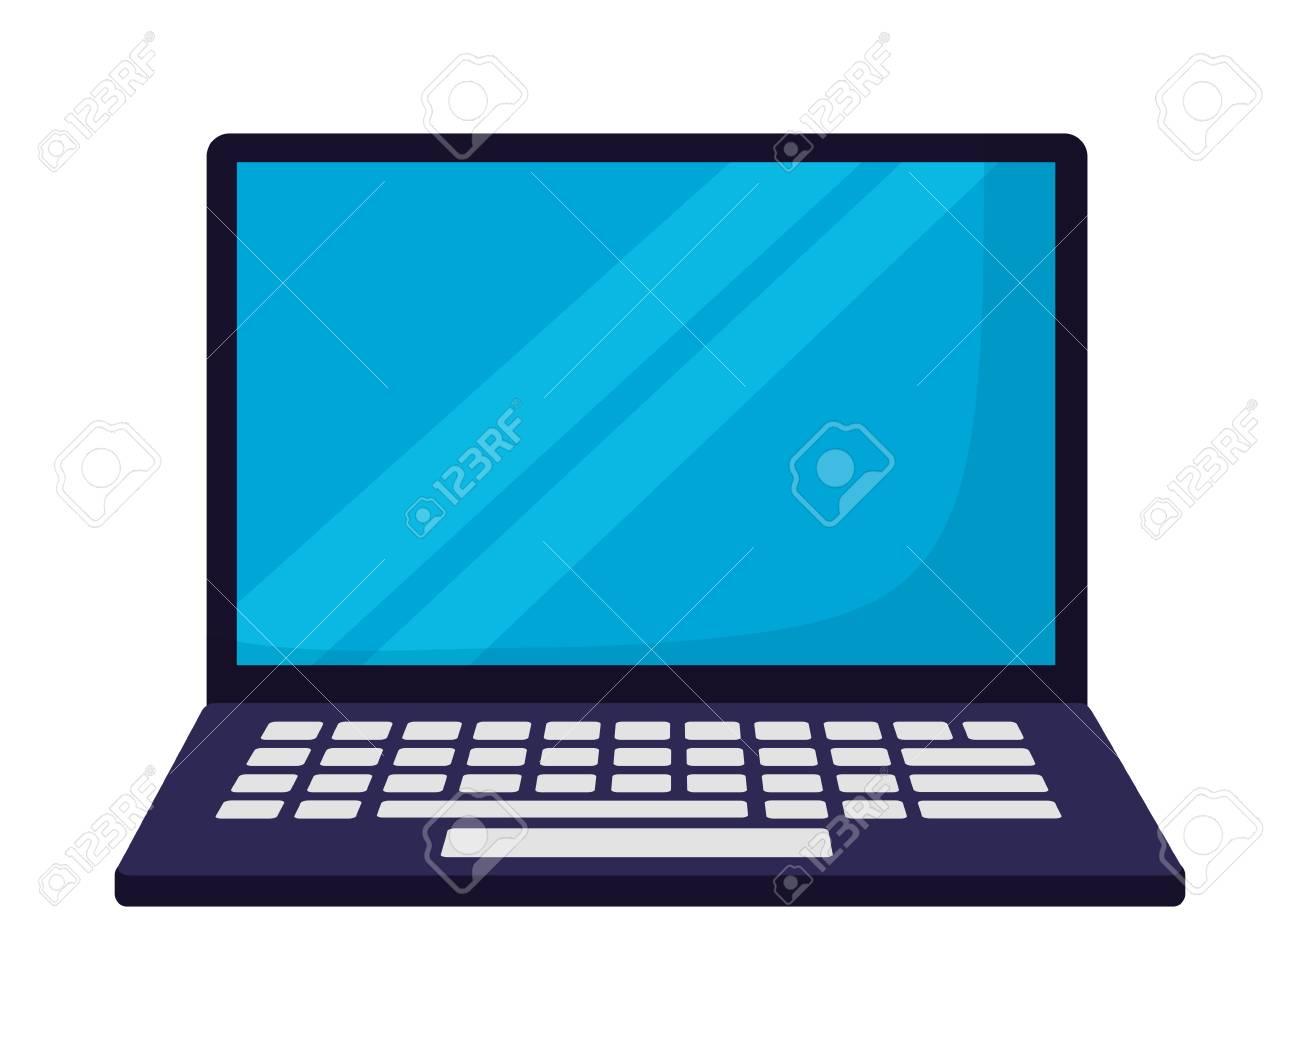 laptop computer on white background vector illustration - 127560990